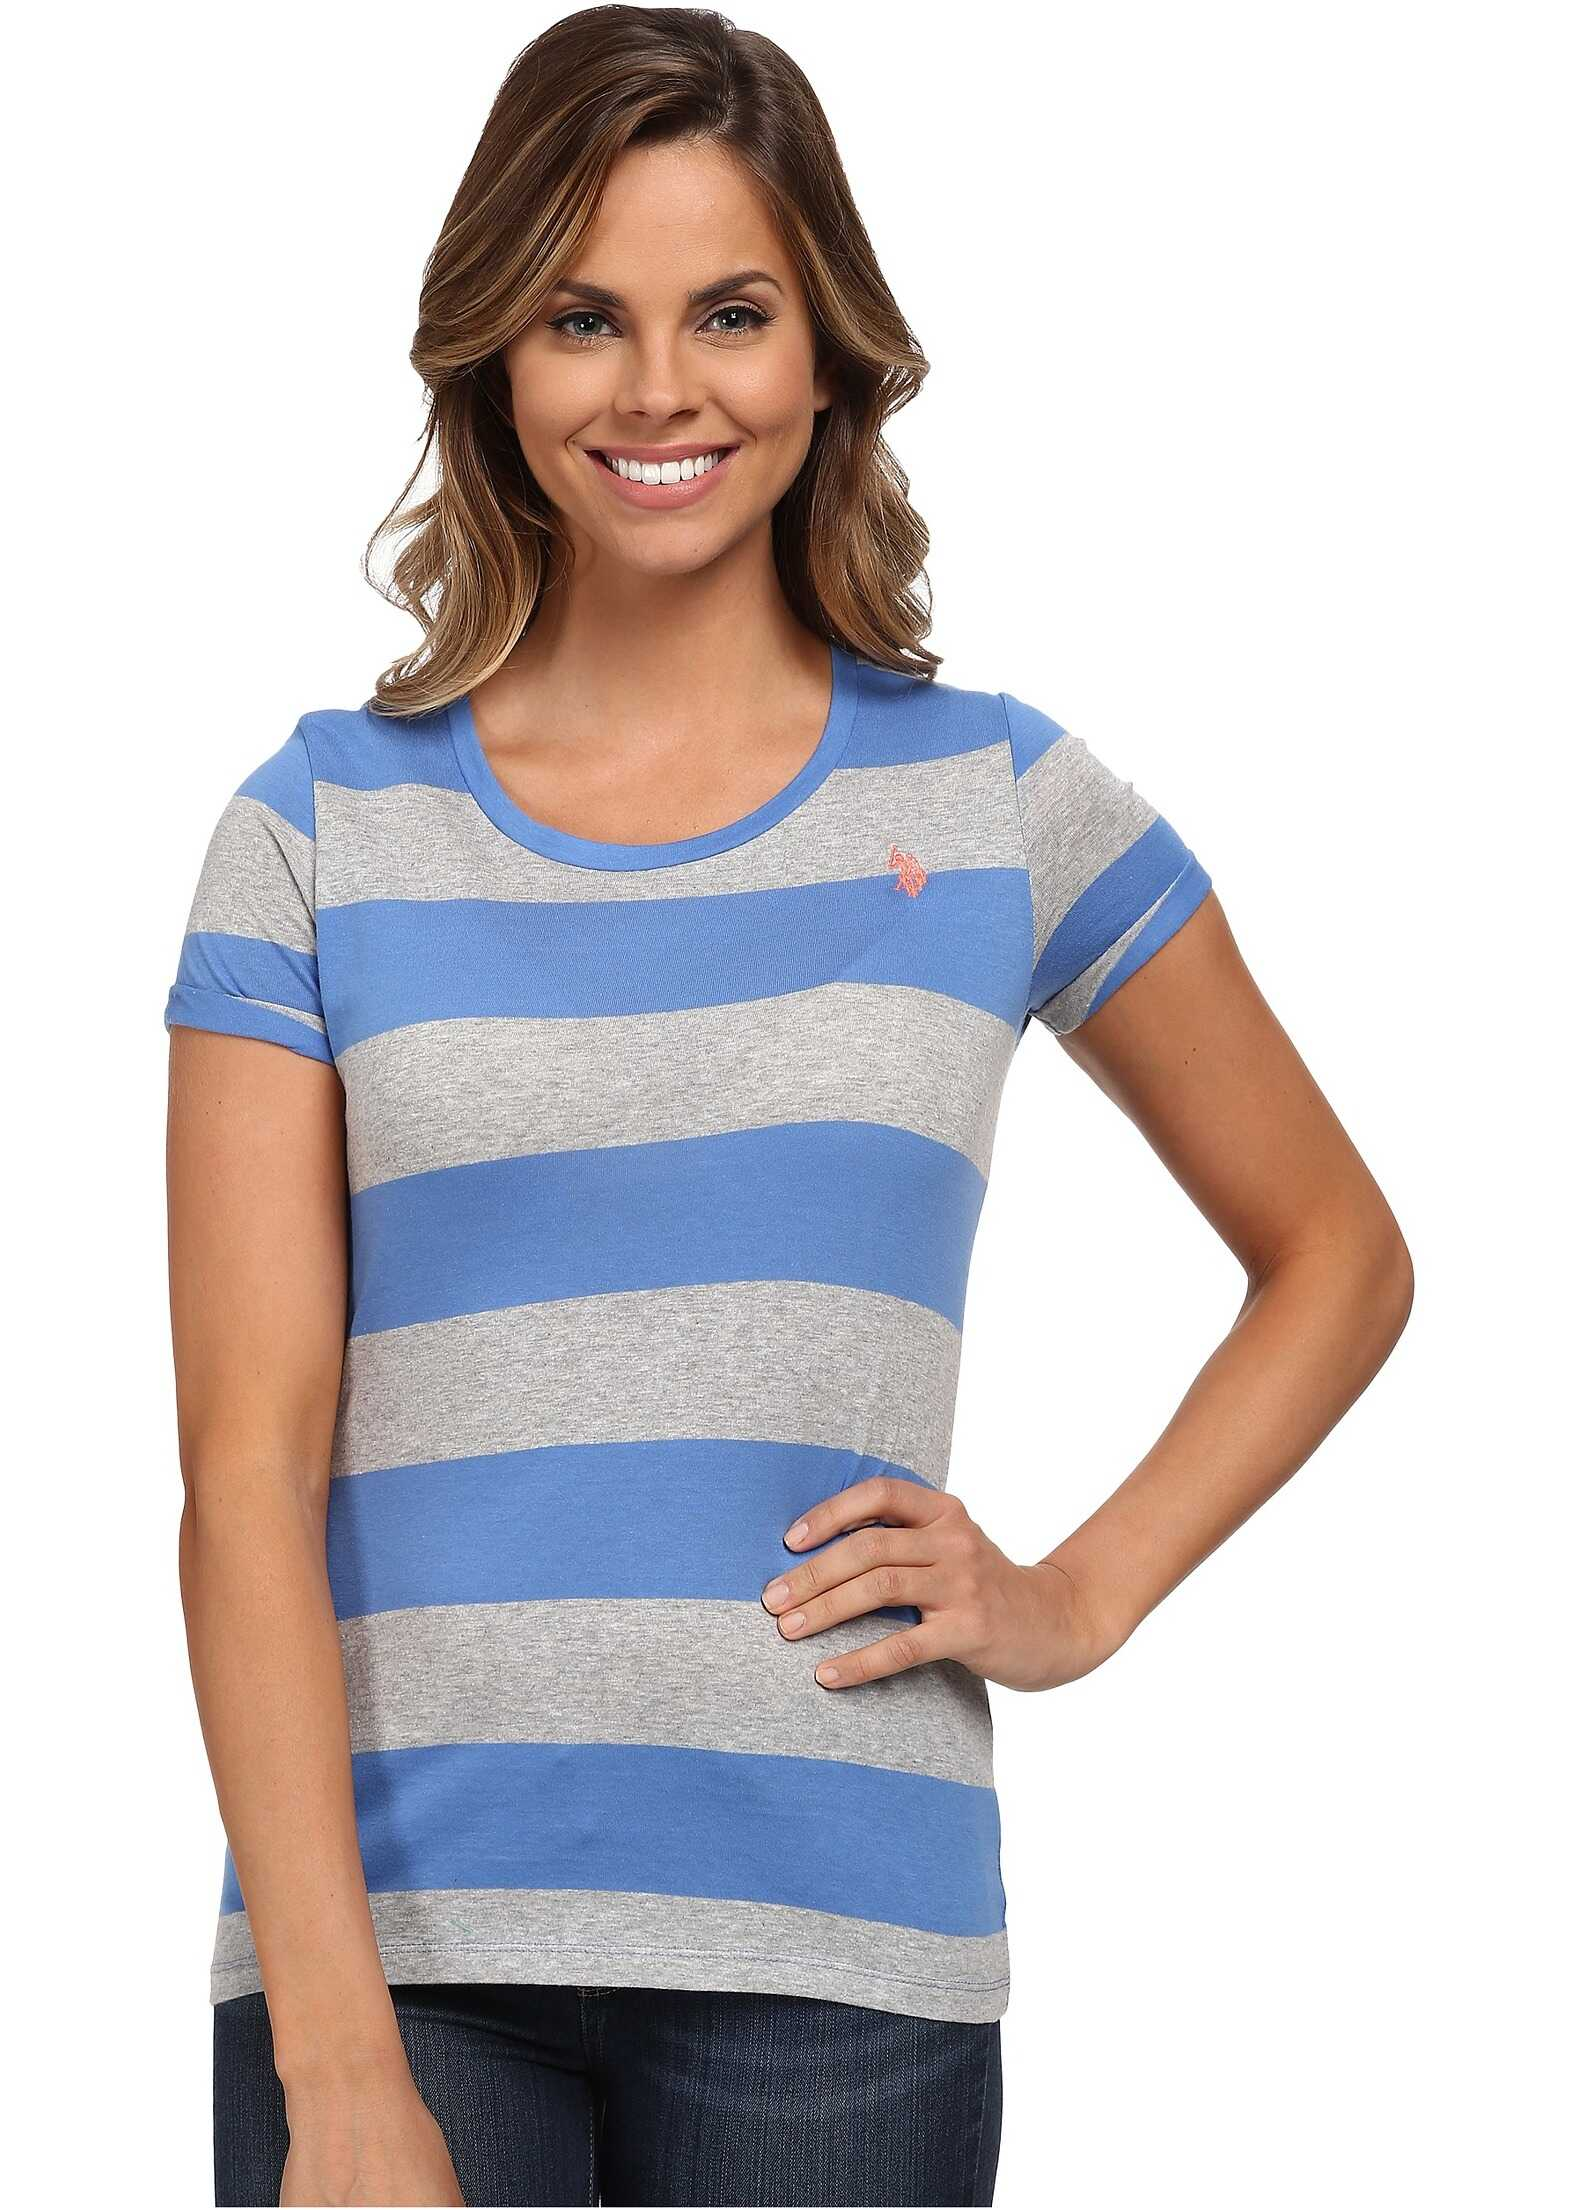 Wide Stripes T-shirt